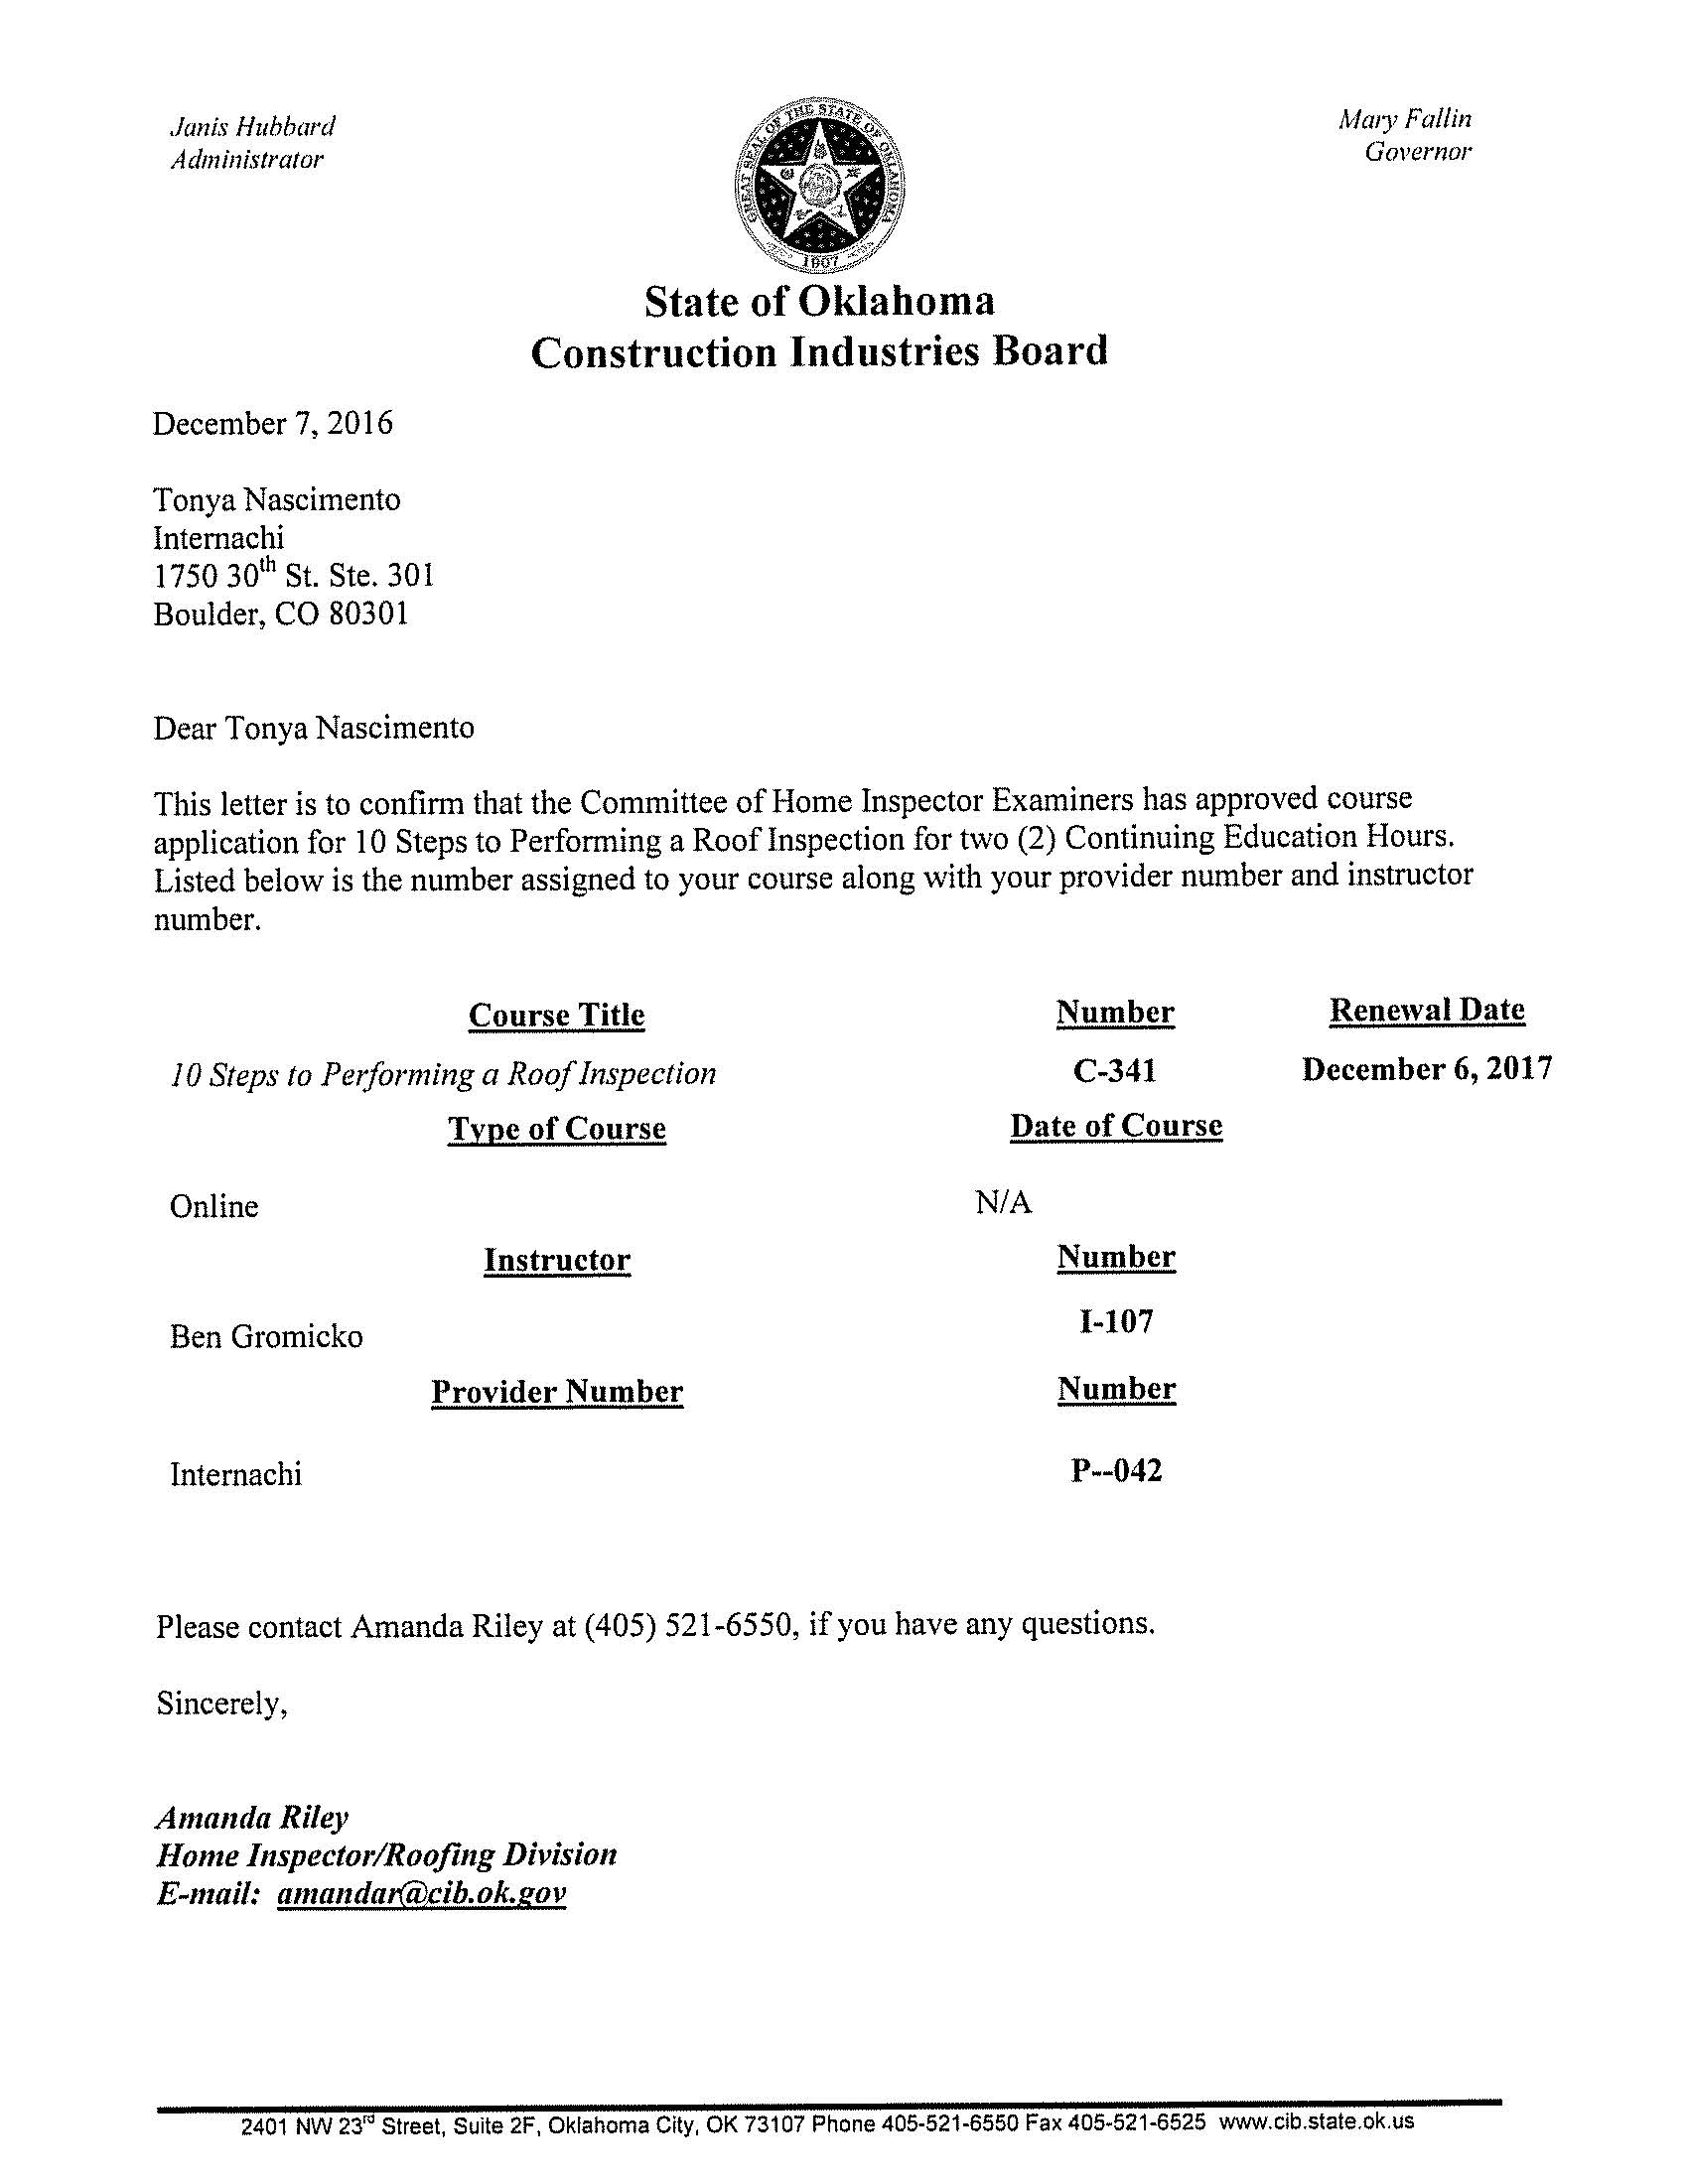 Roofing certification course certifications tribrent sc 1 st course c 341 expiration december 6 2017 sc 1 st internachi image number 12 of roofing certification xflitez Images